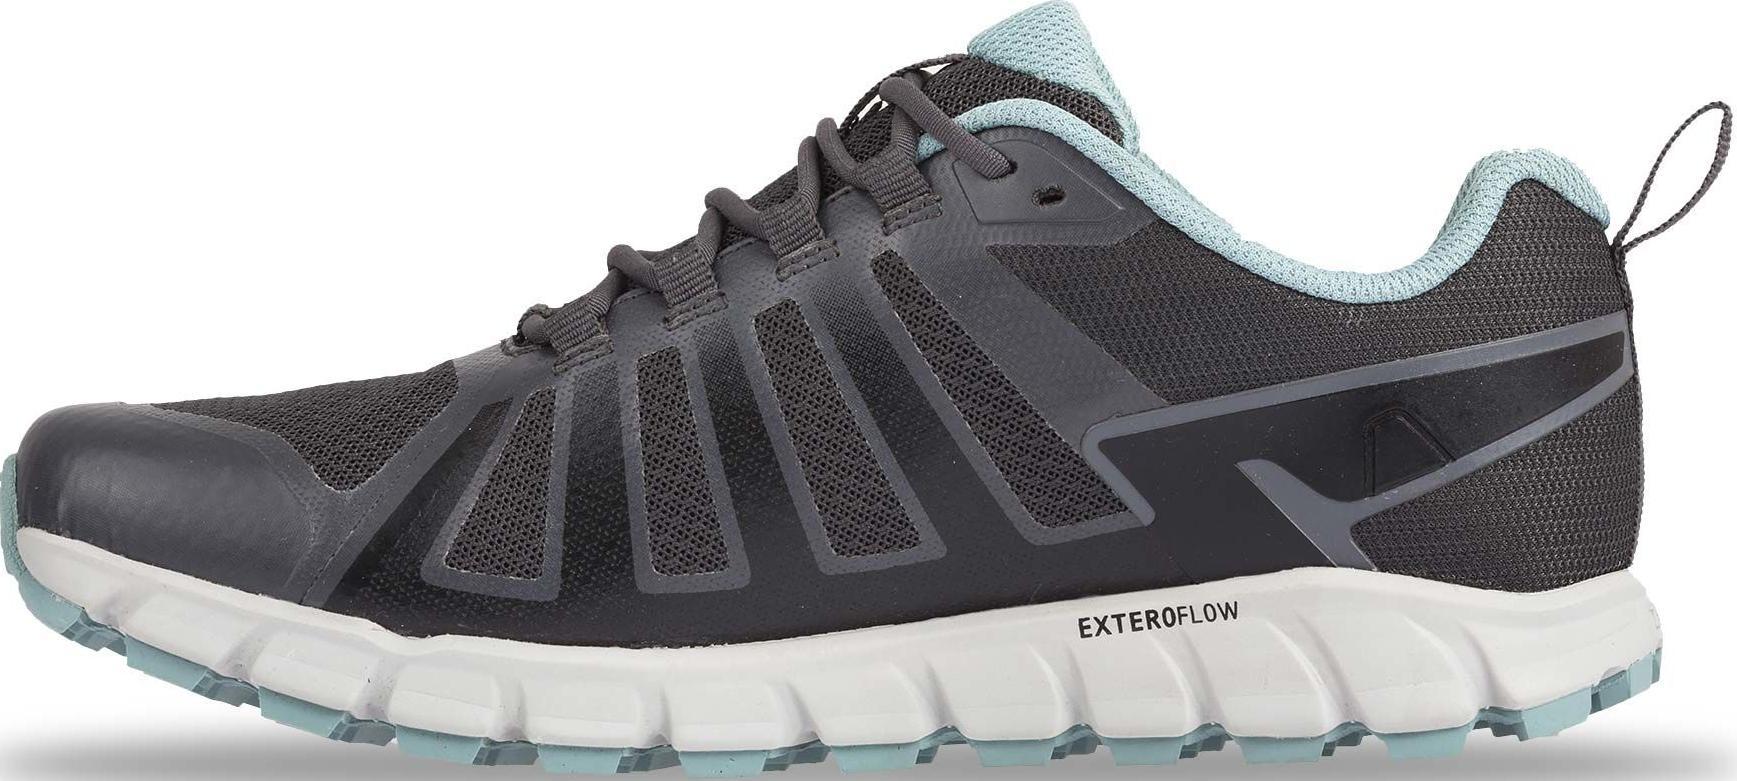 5416760cf2c Boty Inov-8 Terra Ultra 260 (S) grey blue grey